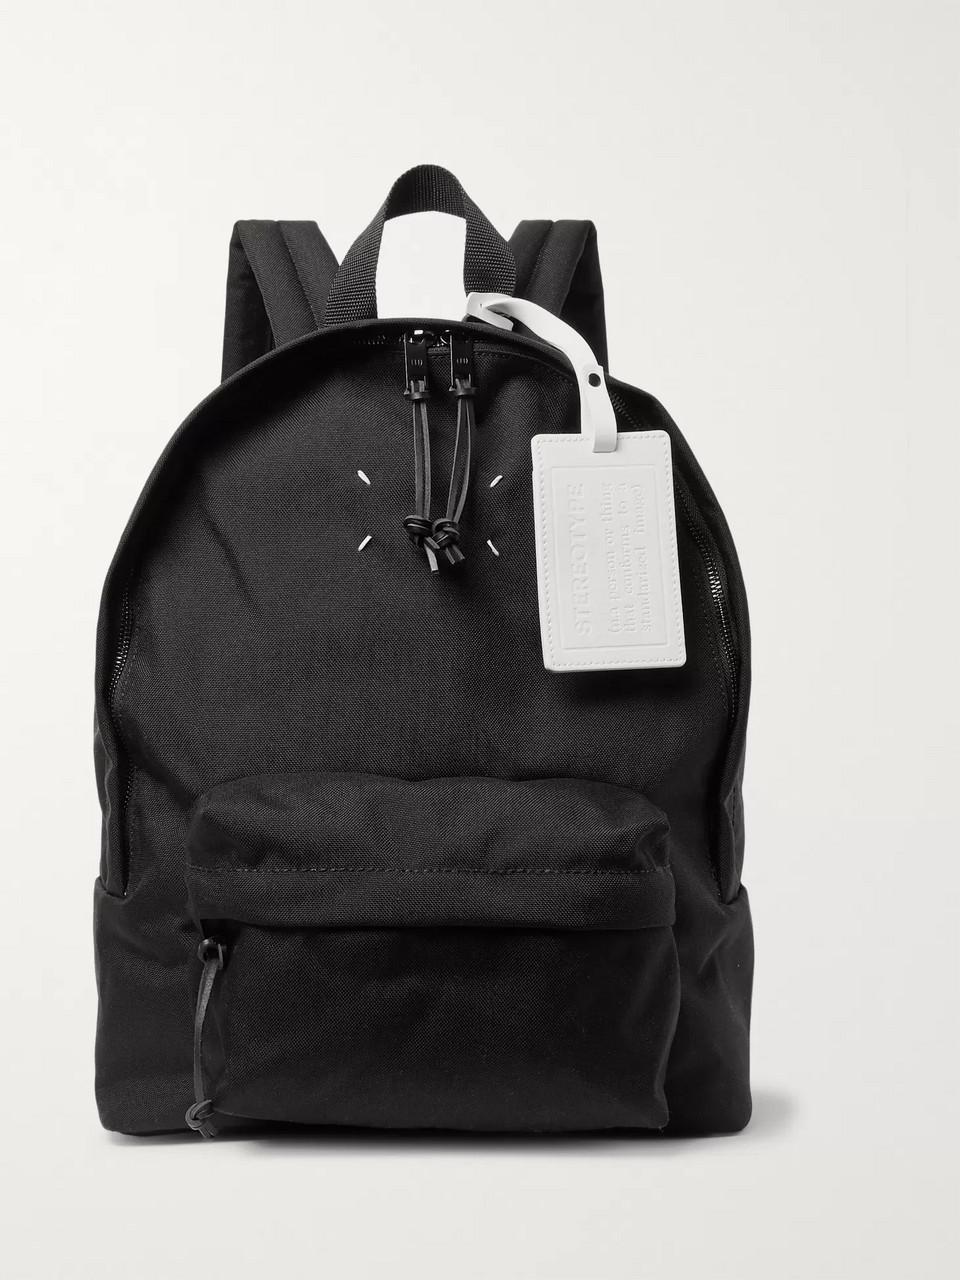 d830536bb140f Maison Margiela Canvas Backpack